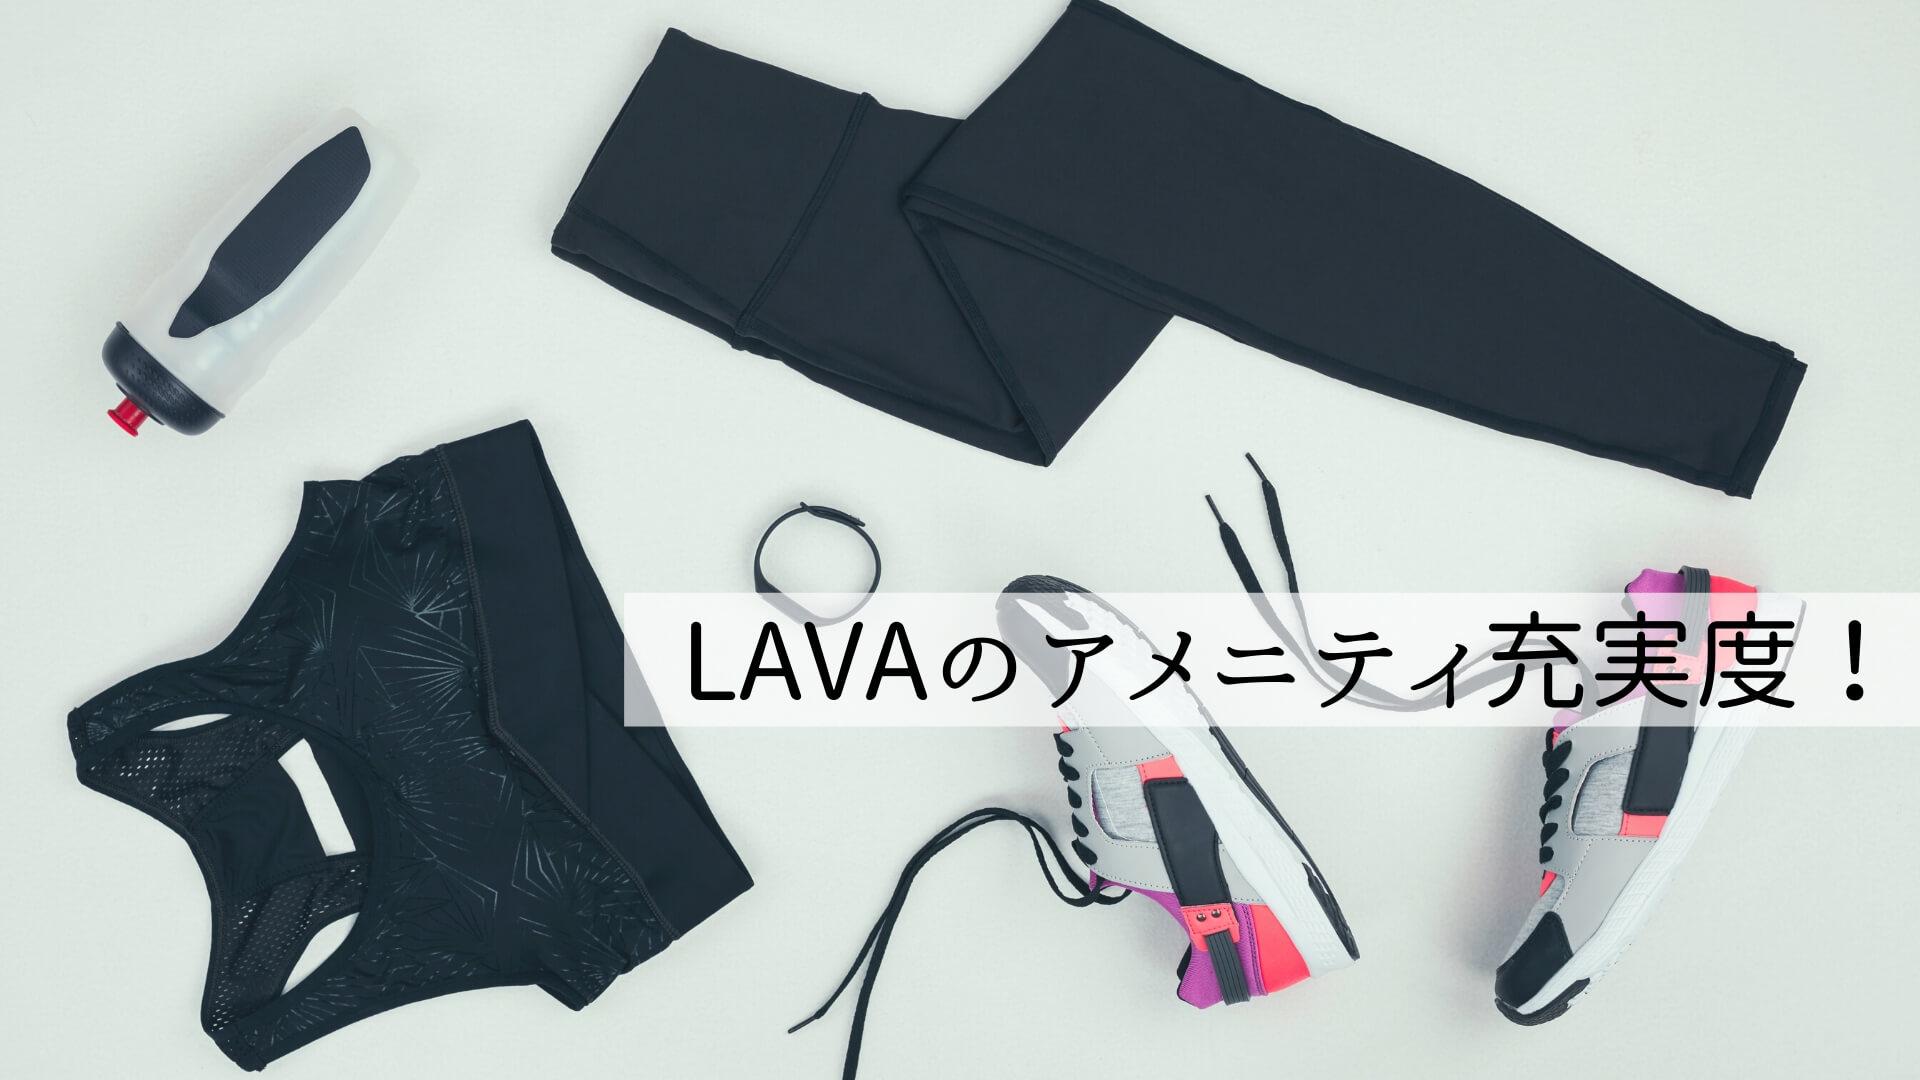 LAVA(ラバ)のアメニティの充実度